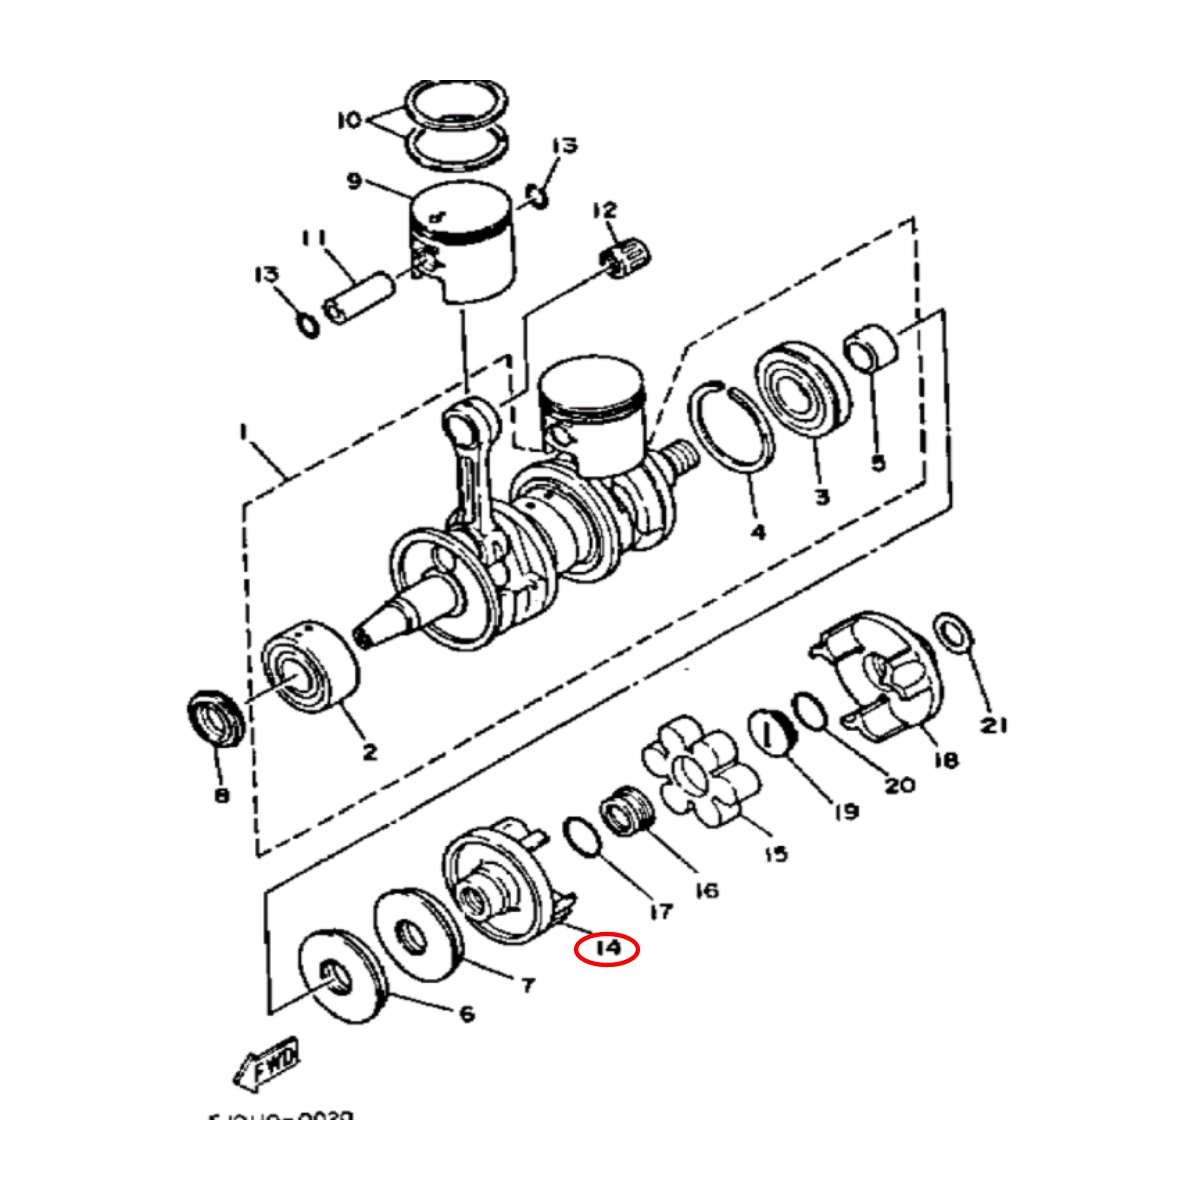 Acoplador para Jet Ski Yamaha 22mm 3D  - Radical Peças - Peças para Jet Ski